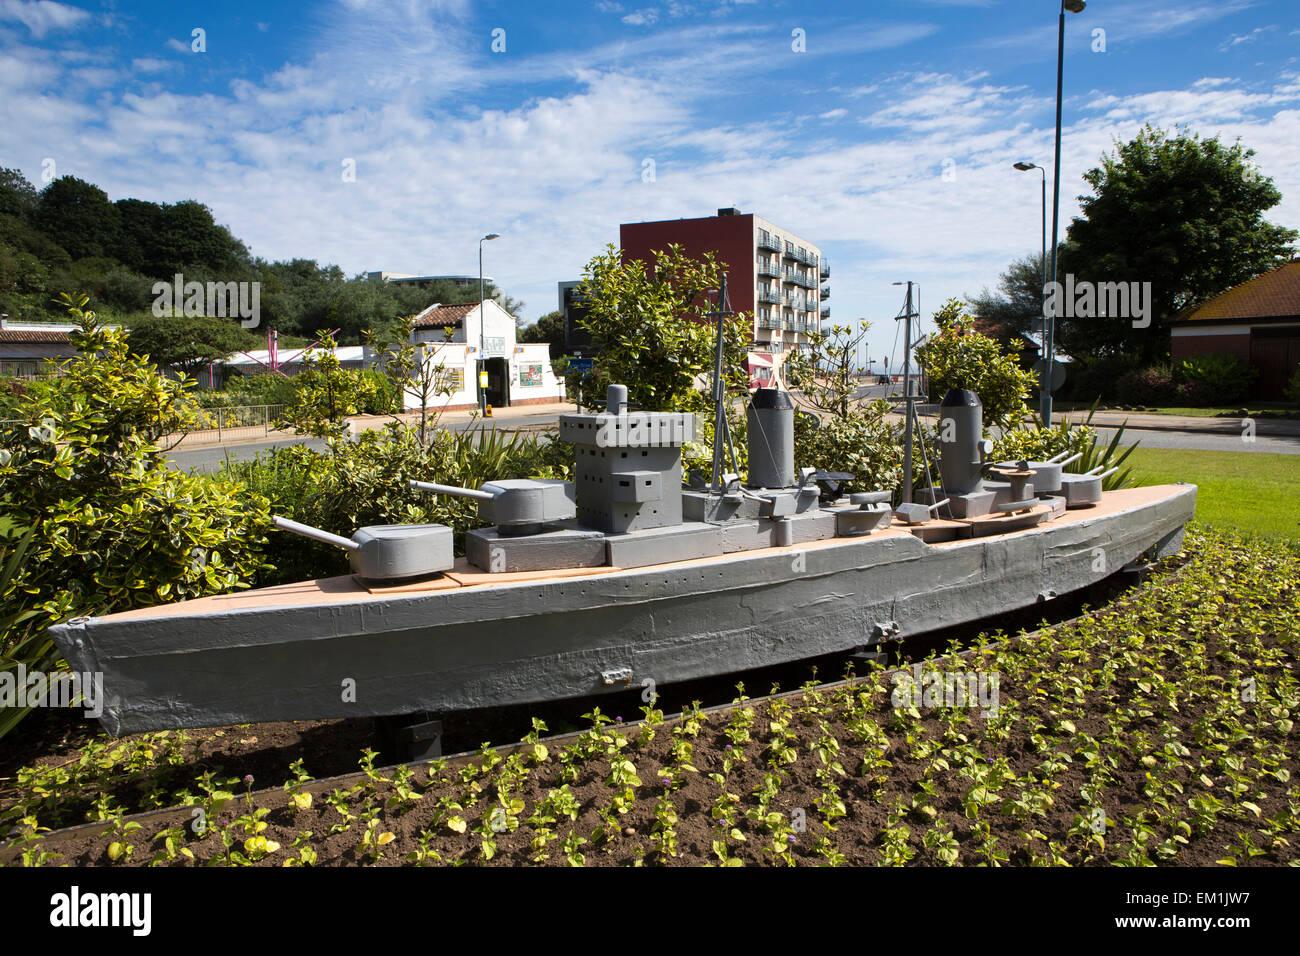 UK, England, Yorkshire, Scarborough, North Sands, Peasholm Roundabout, metal warship sculpture - Stock Image